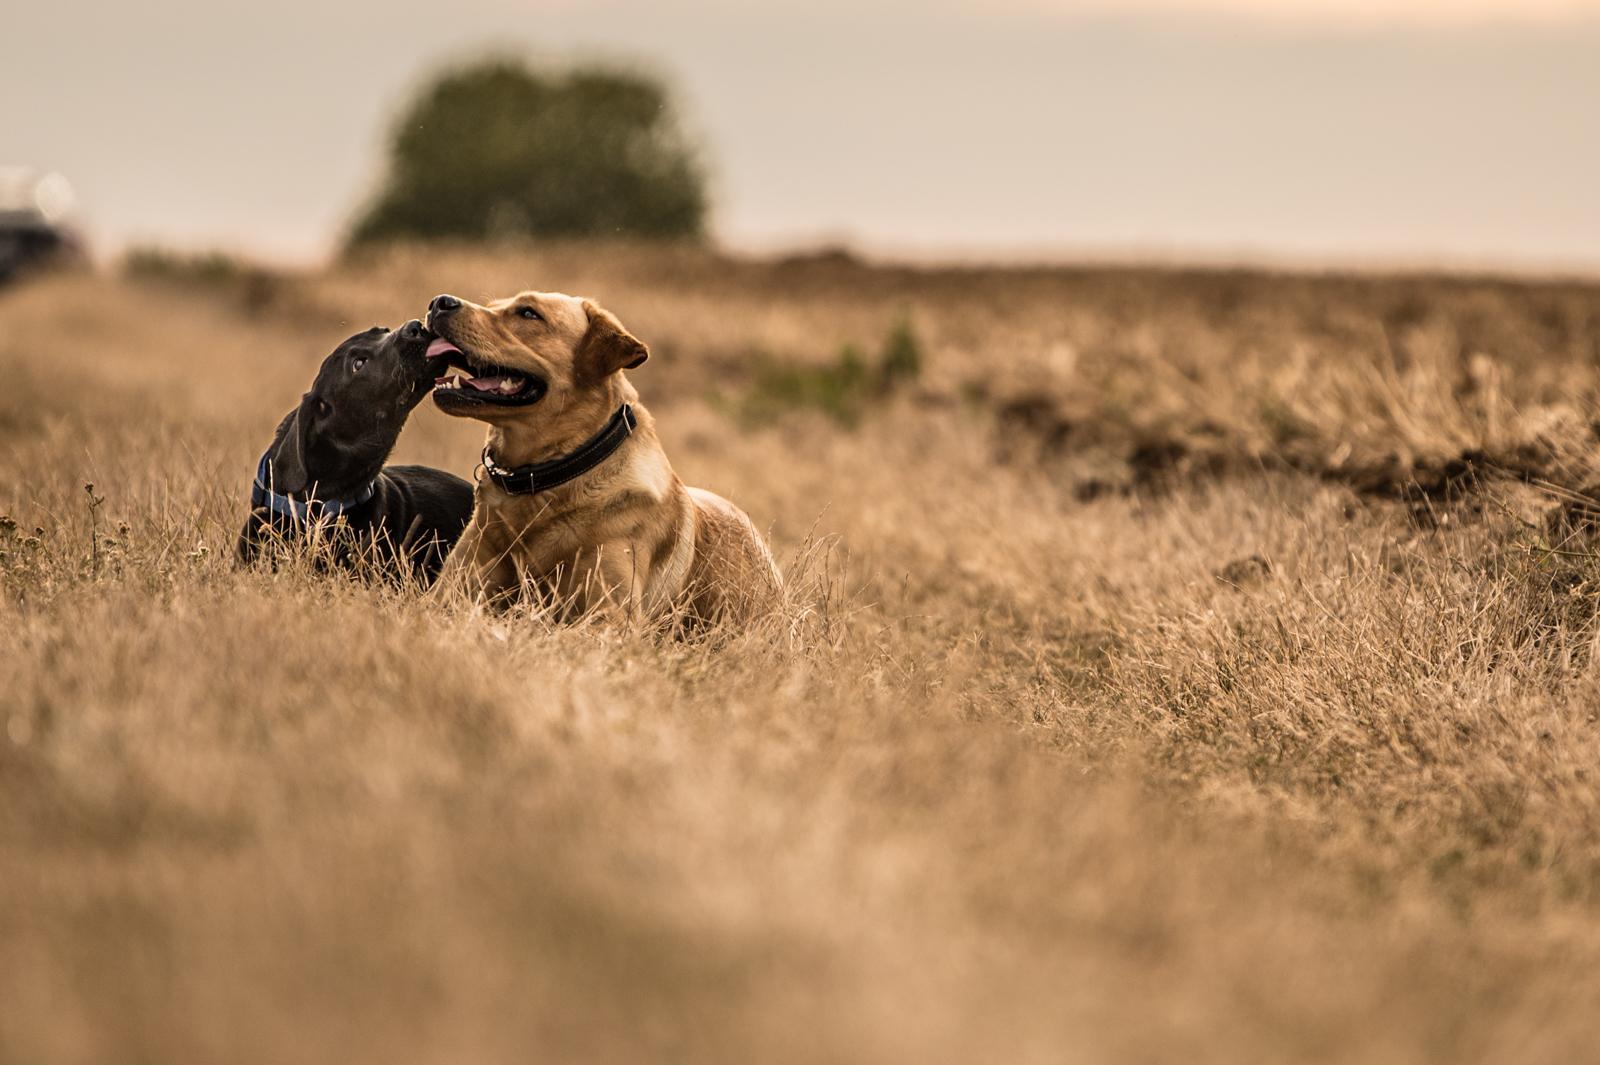 Tierfotograf-Labrador-Sven's Bildwerke-Hund-Hundefotografie8